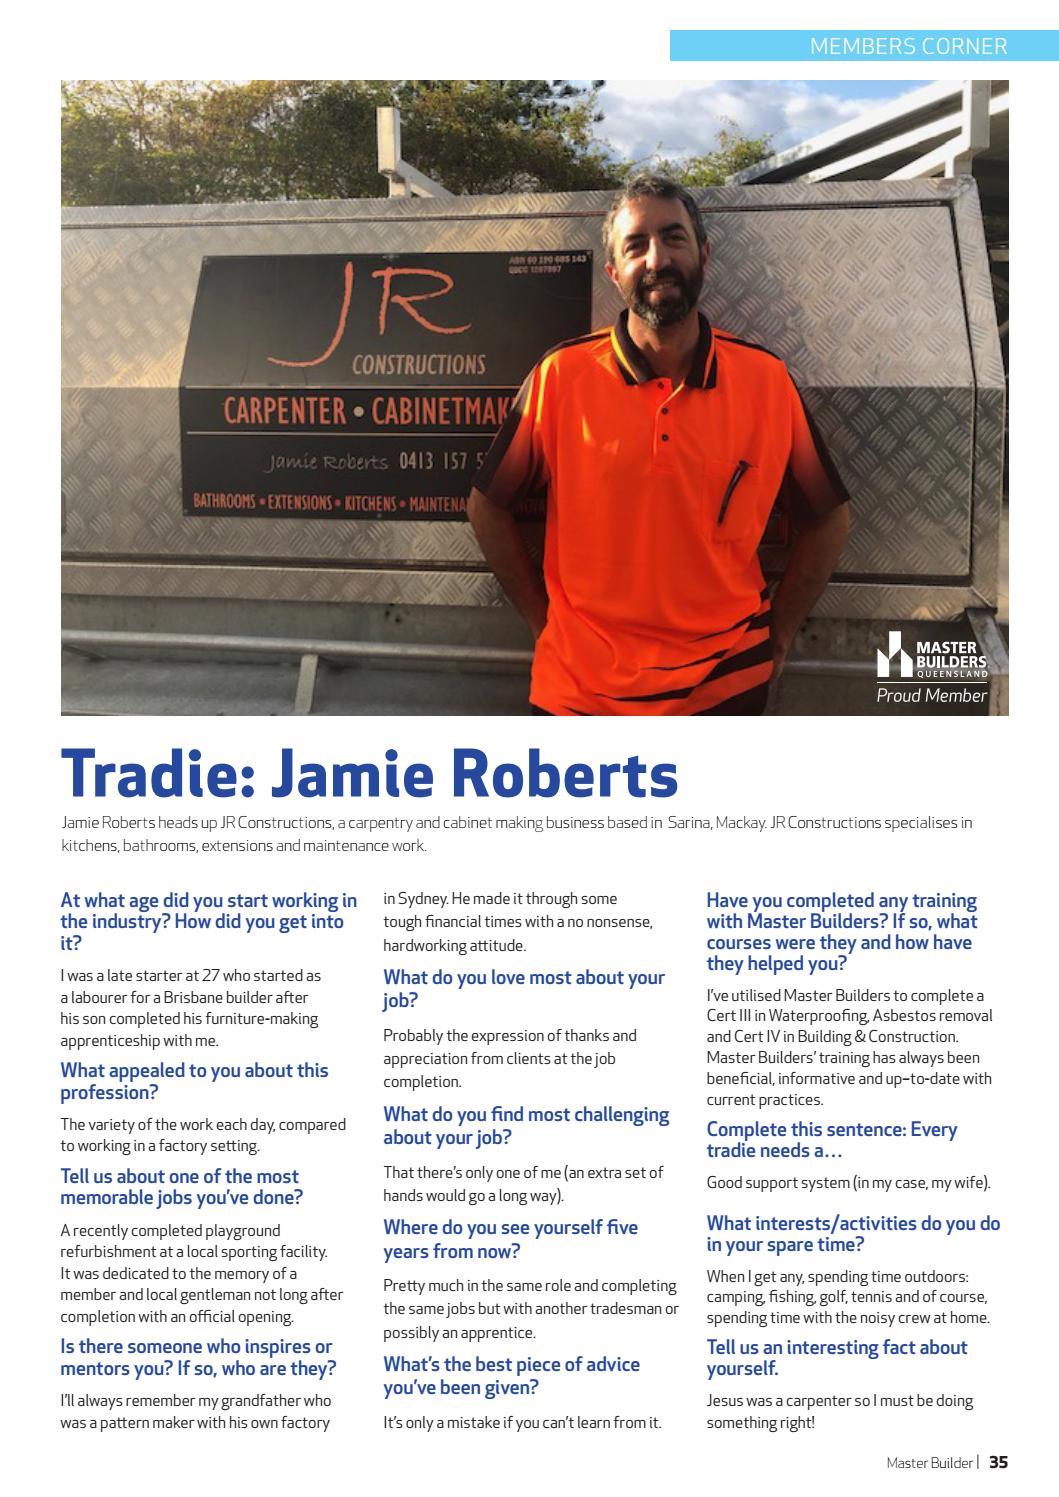 Master Builders magazine - October - December 2018 by Master